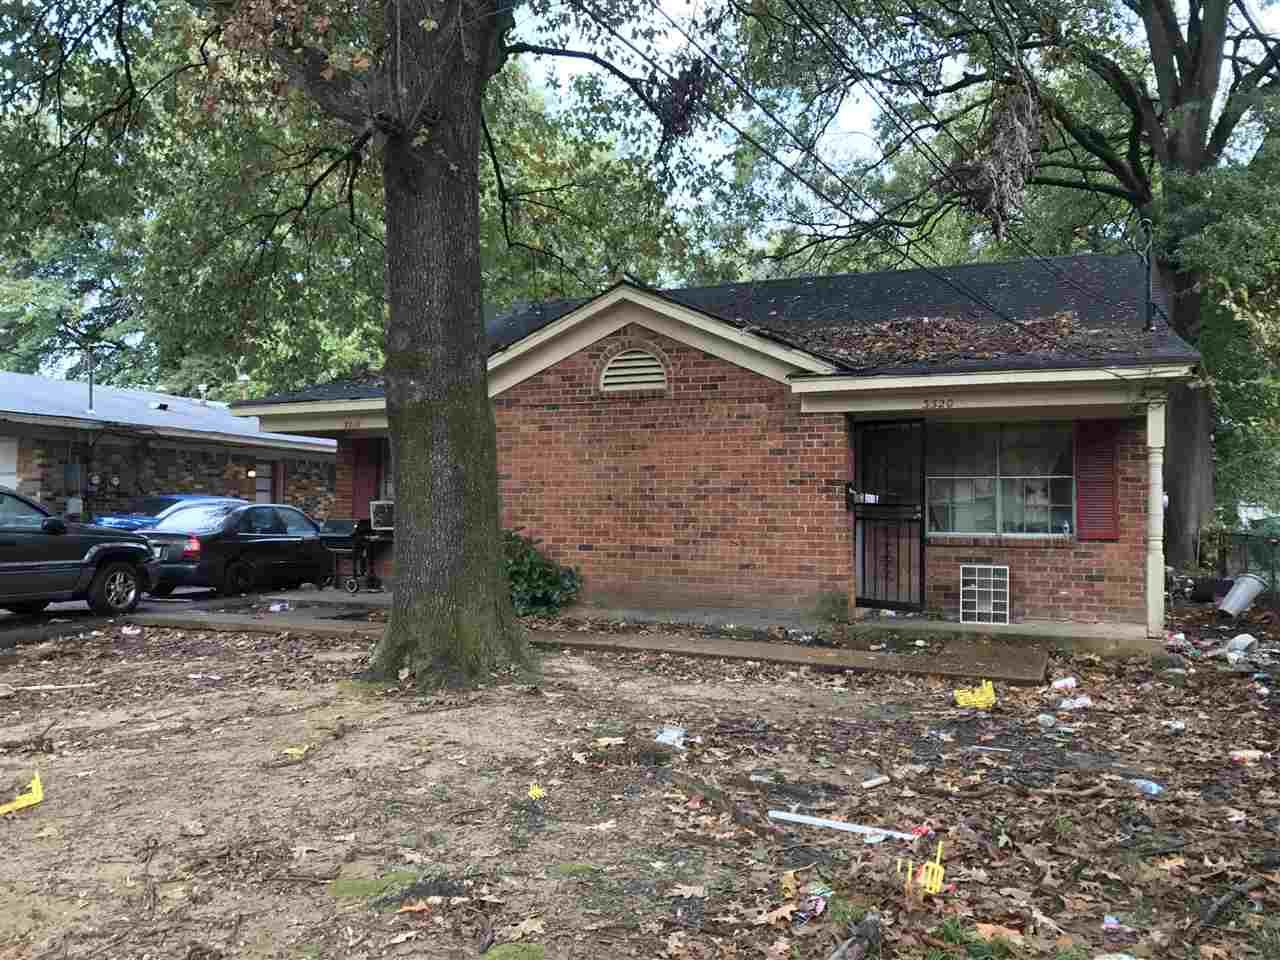 3318 Powell Memphis, TN 38122 - MLS #: 10020406